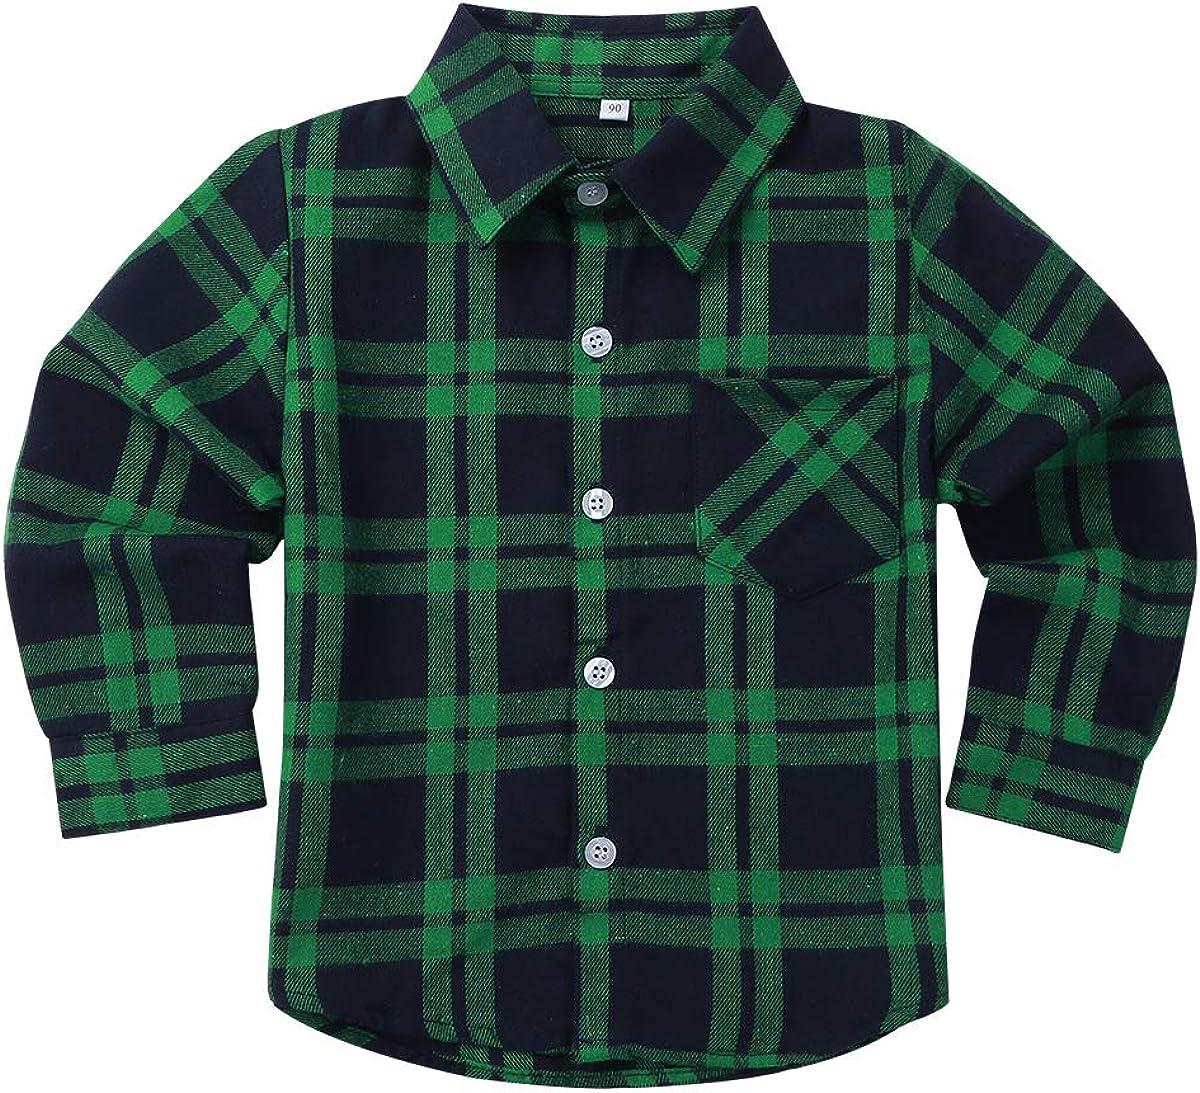 ACSUSS Kids Boys Long Sleeves Plaid Lapel Collar Shirt Children Autumn Fall Button Down Flannel Shirt Tops